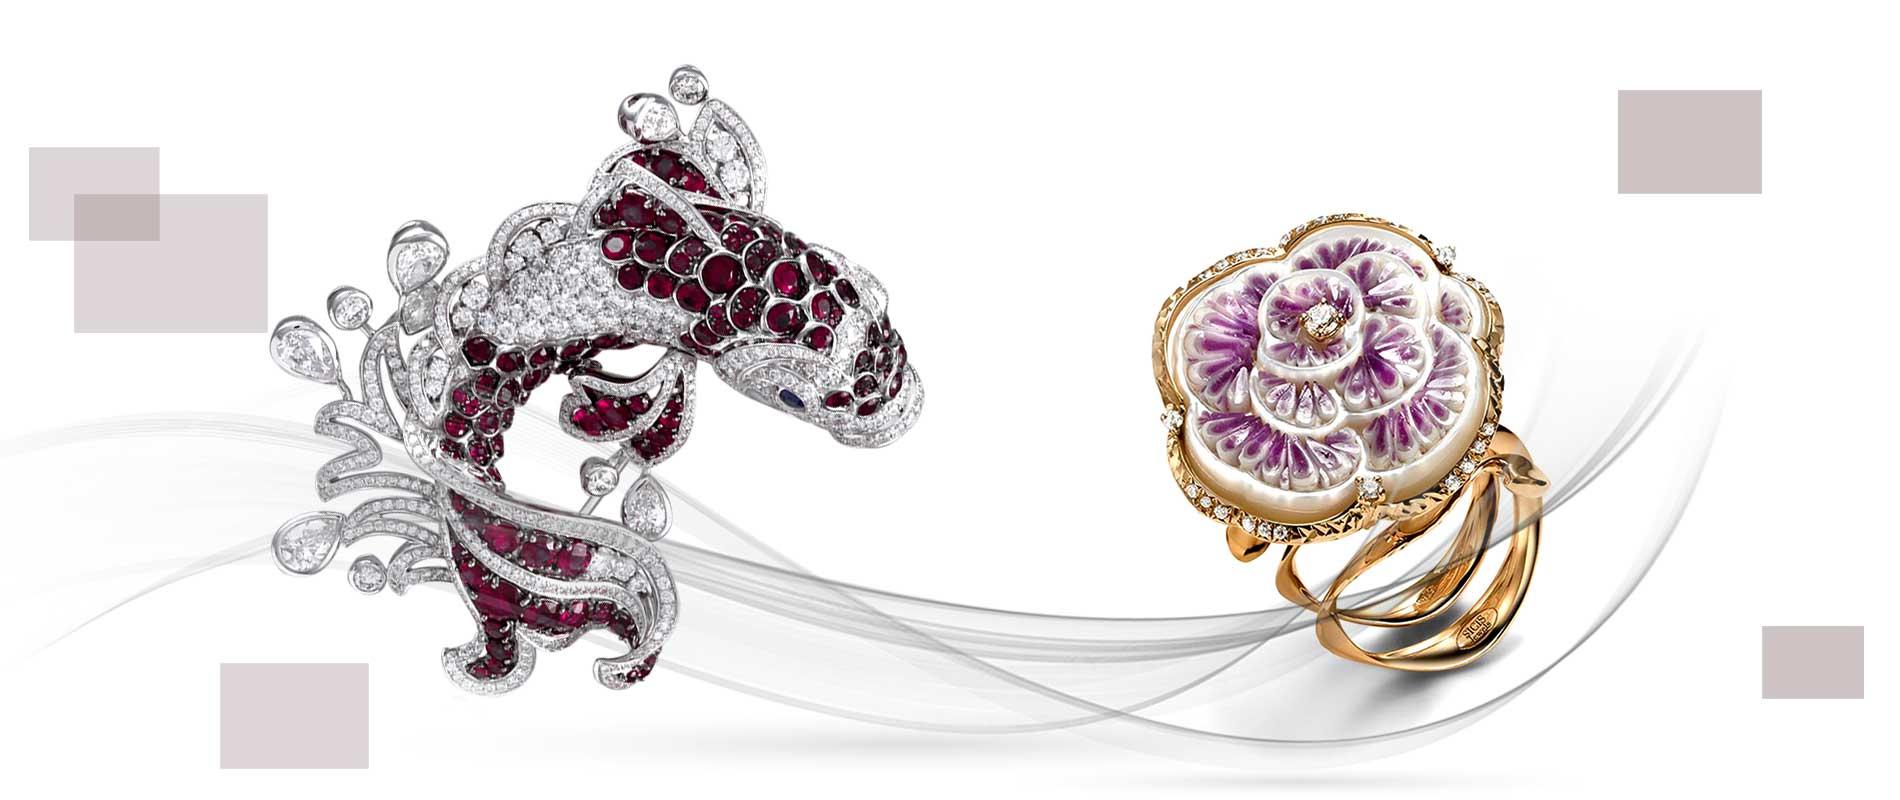 Jewellery designers r5 1 - استفاده از مواد اولیه غیر متعارف در جواهر سازی